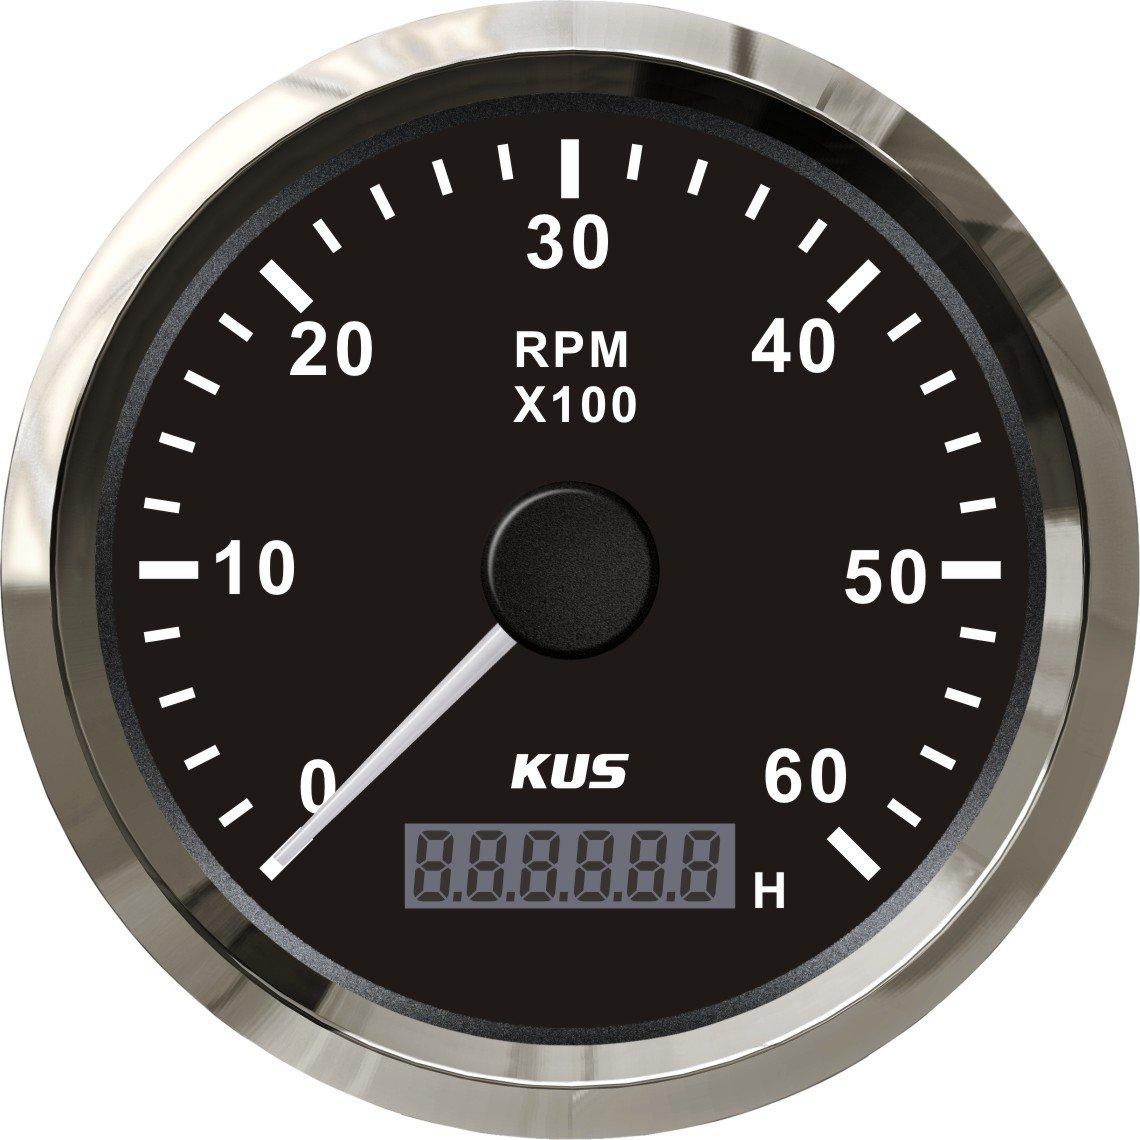 KUS DN85mm White Tachometer 0-6000rpm for Diesel Engine PN KY07101 White